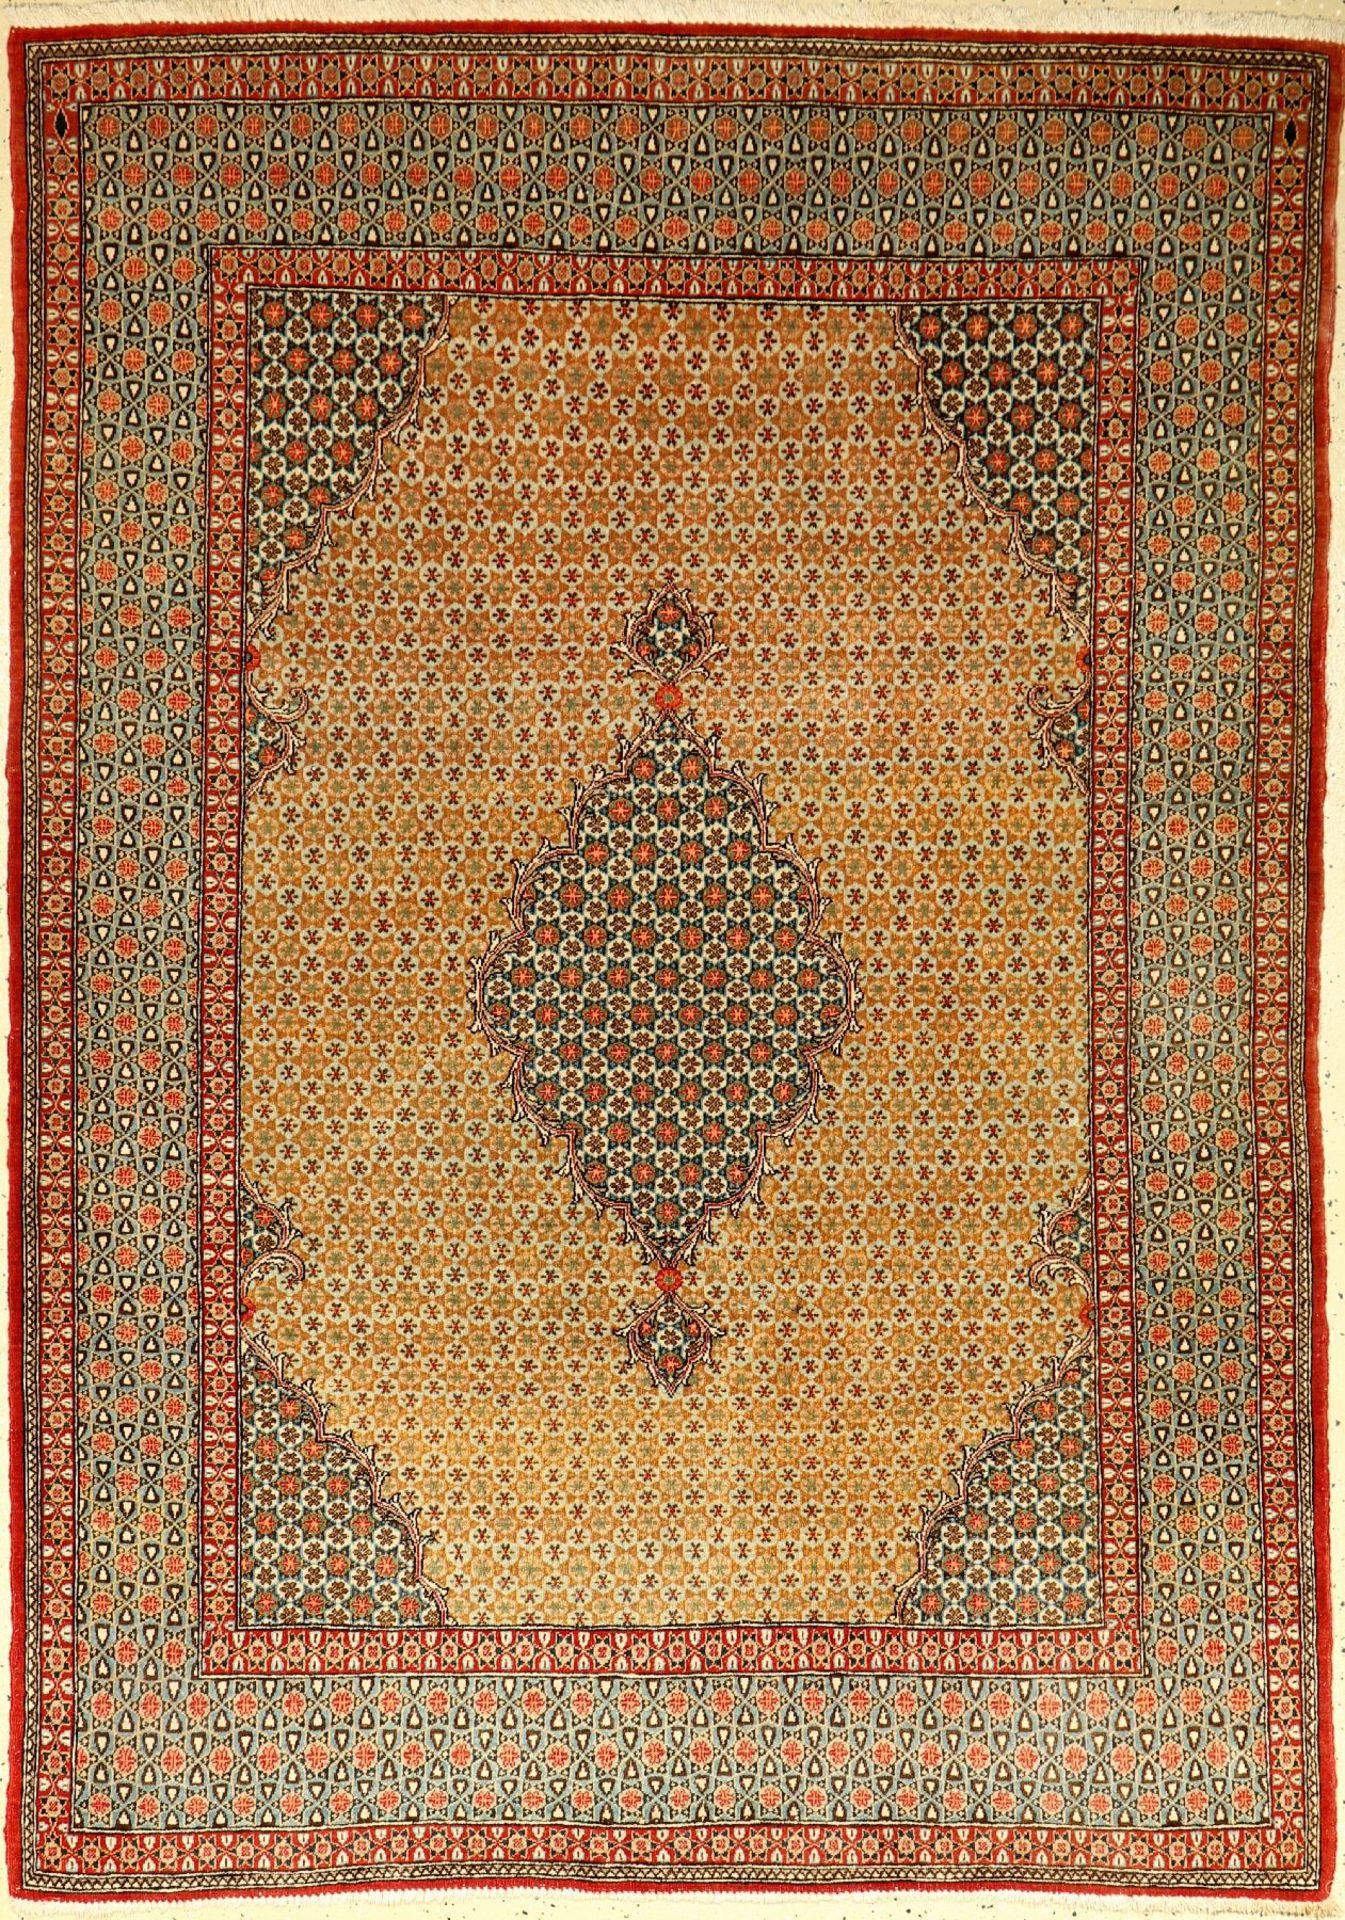 Ghom alt, Persien, ca. 60 Jahre, Korkwolle mit Seide, ca. 195 x 140 cm, EHZ: 2-3Qom old, Persia,